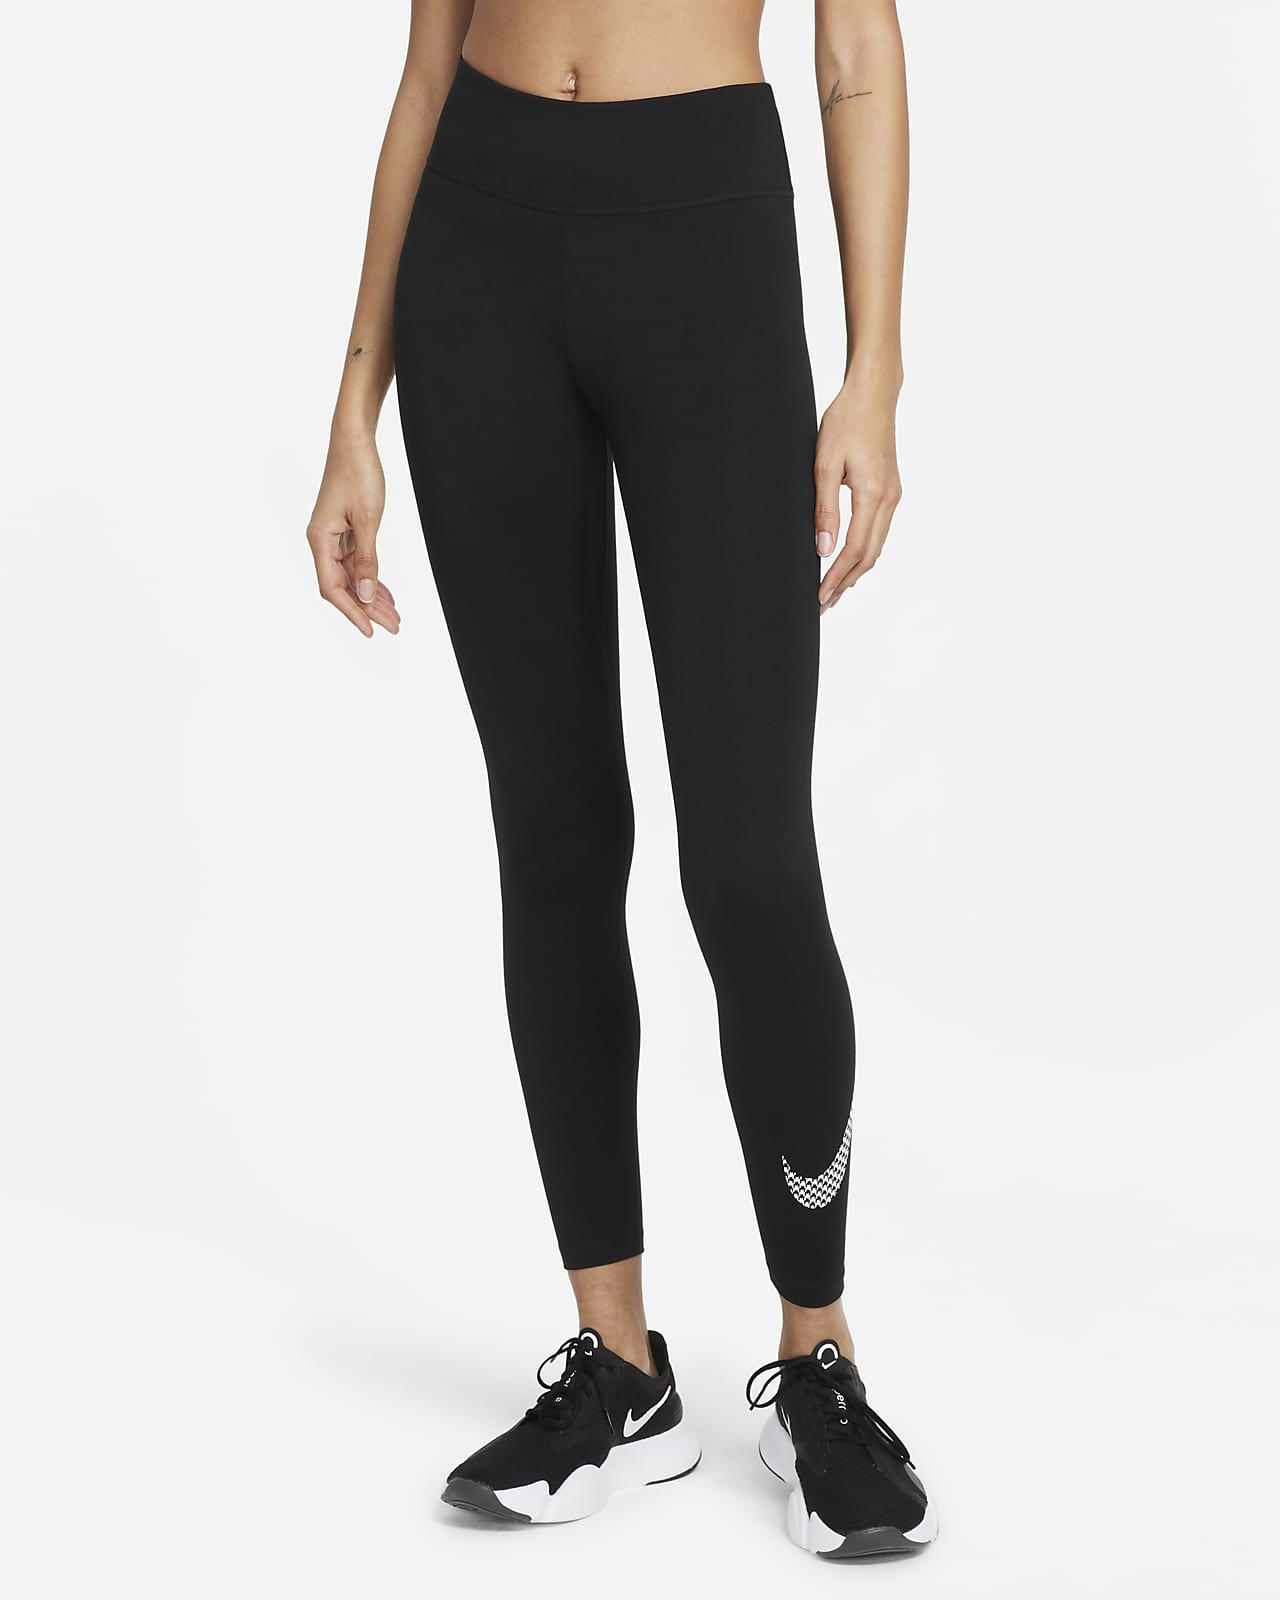 Nike Dri-FIT One Icon Clash Women's Mid-Rise Graphic Leggings